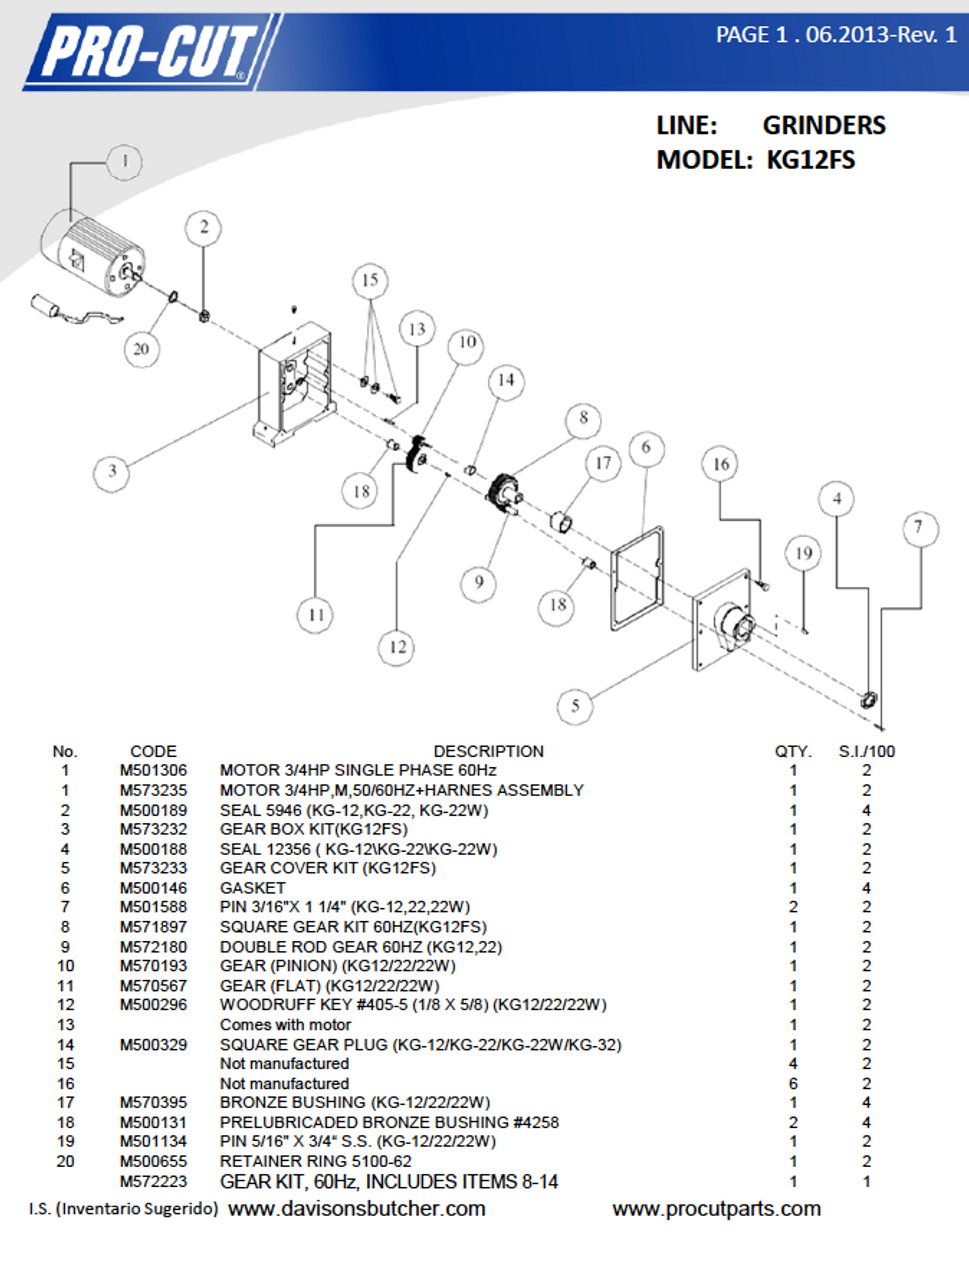 22 Meat Grinder Parts Diagram - Electrical Wiring Diagram •